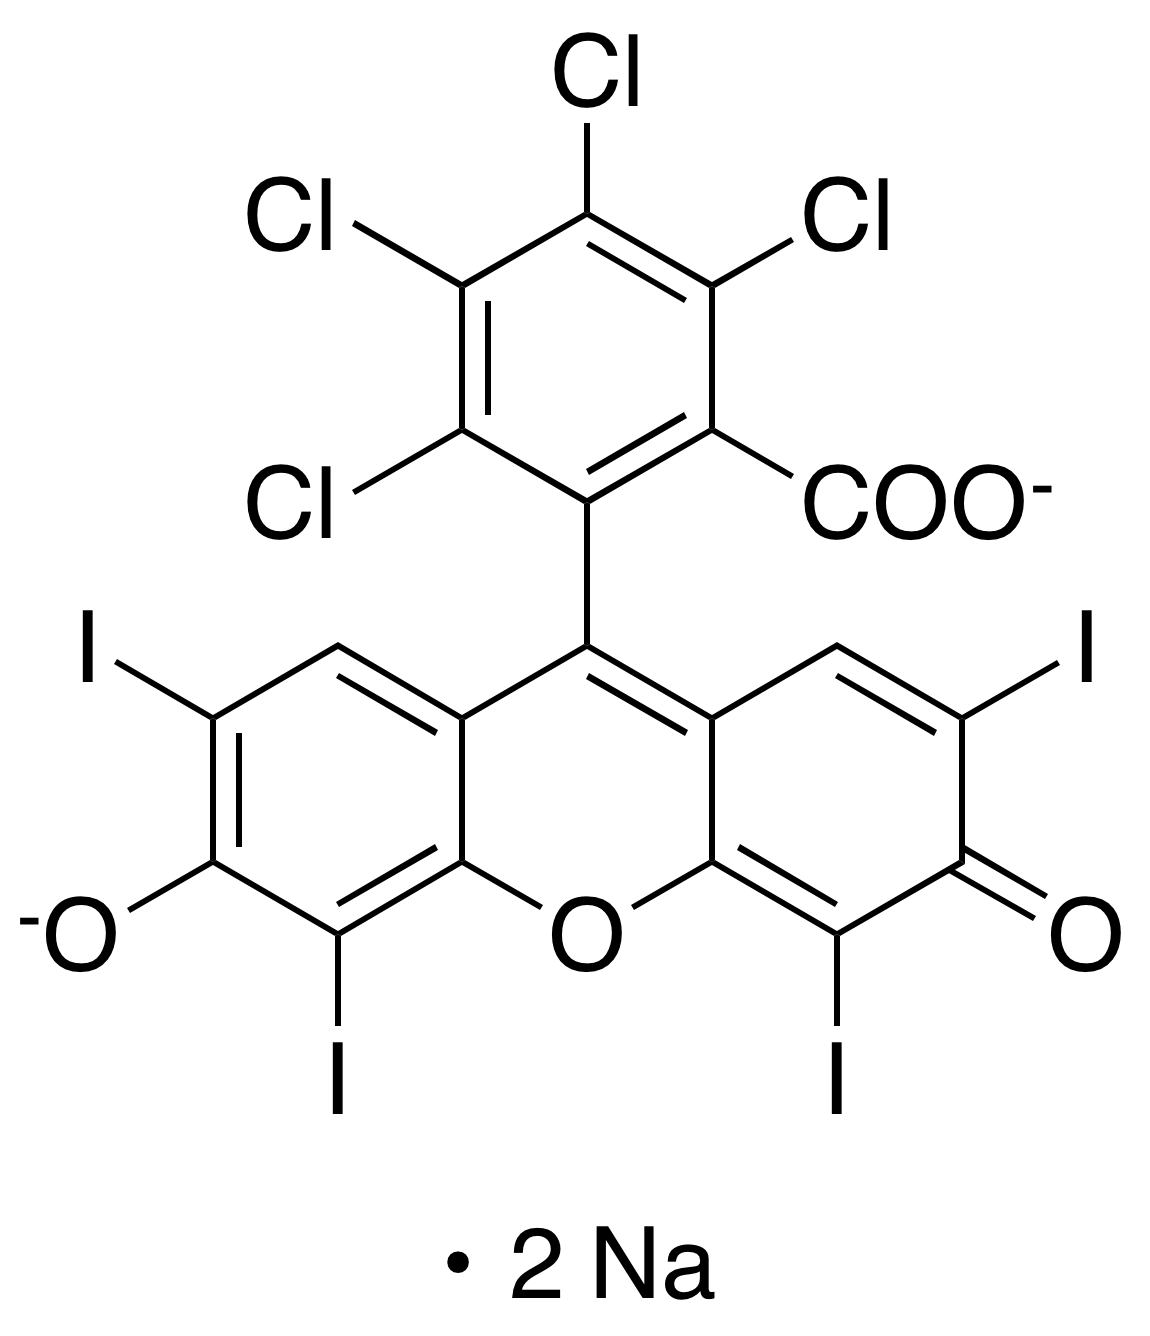 Rose Bengal, C.I. 45440, Certified